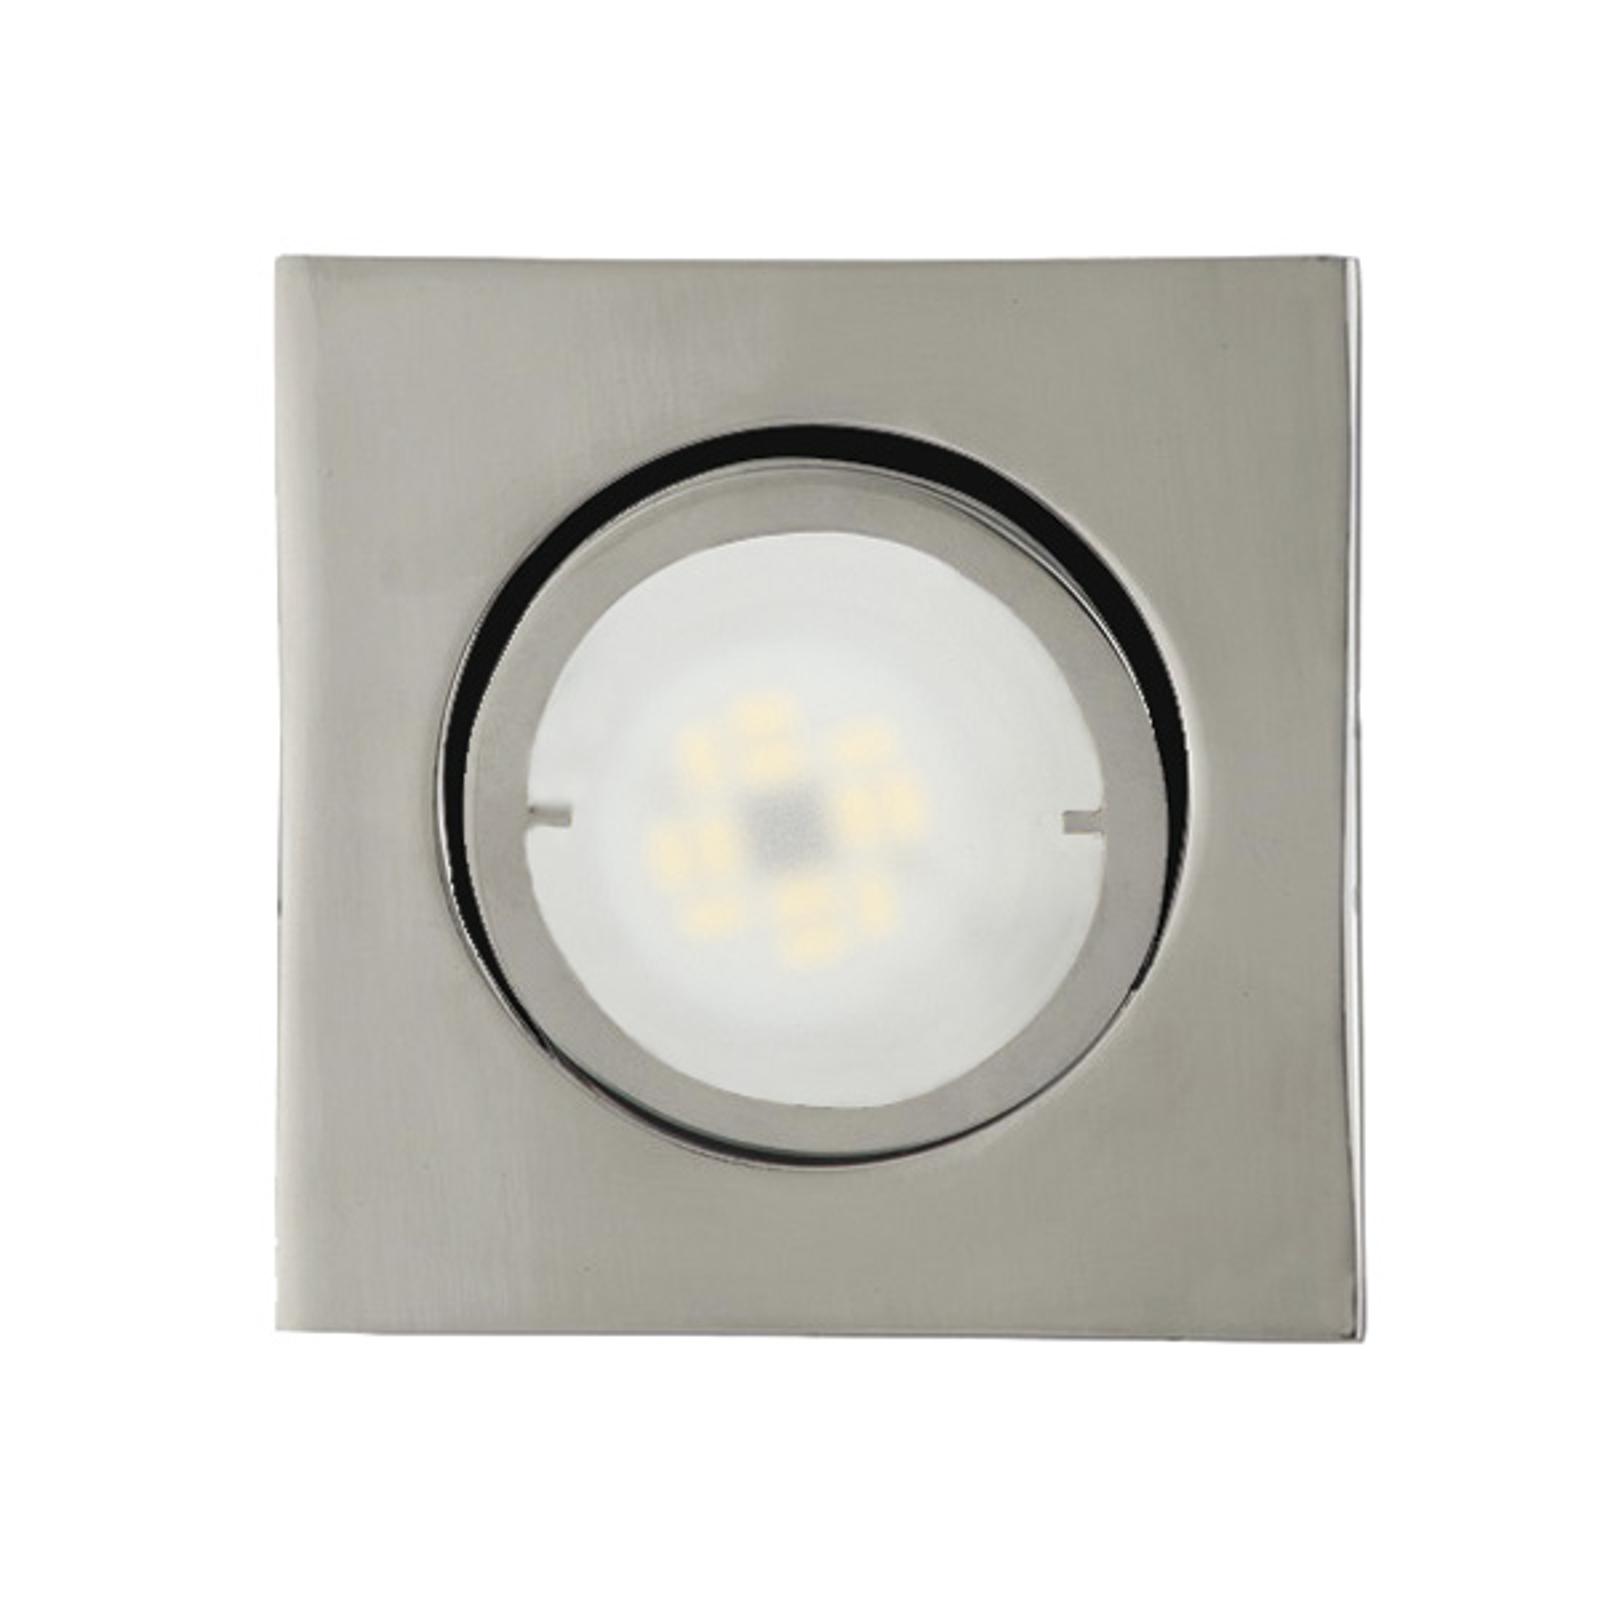 Hoekige LED inbouwlamp Joanie, chroom